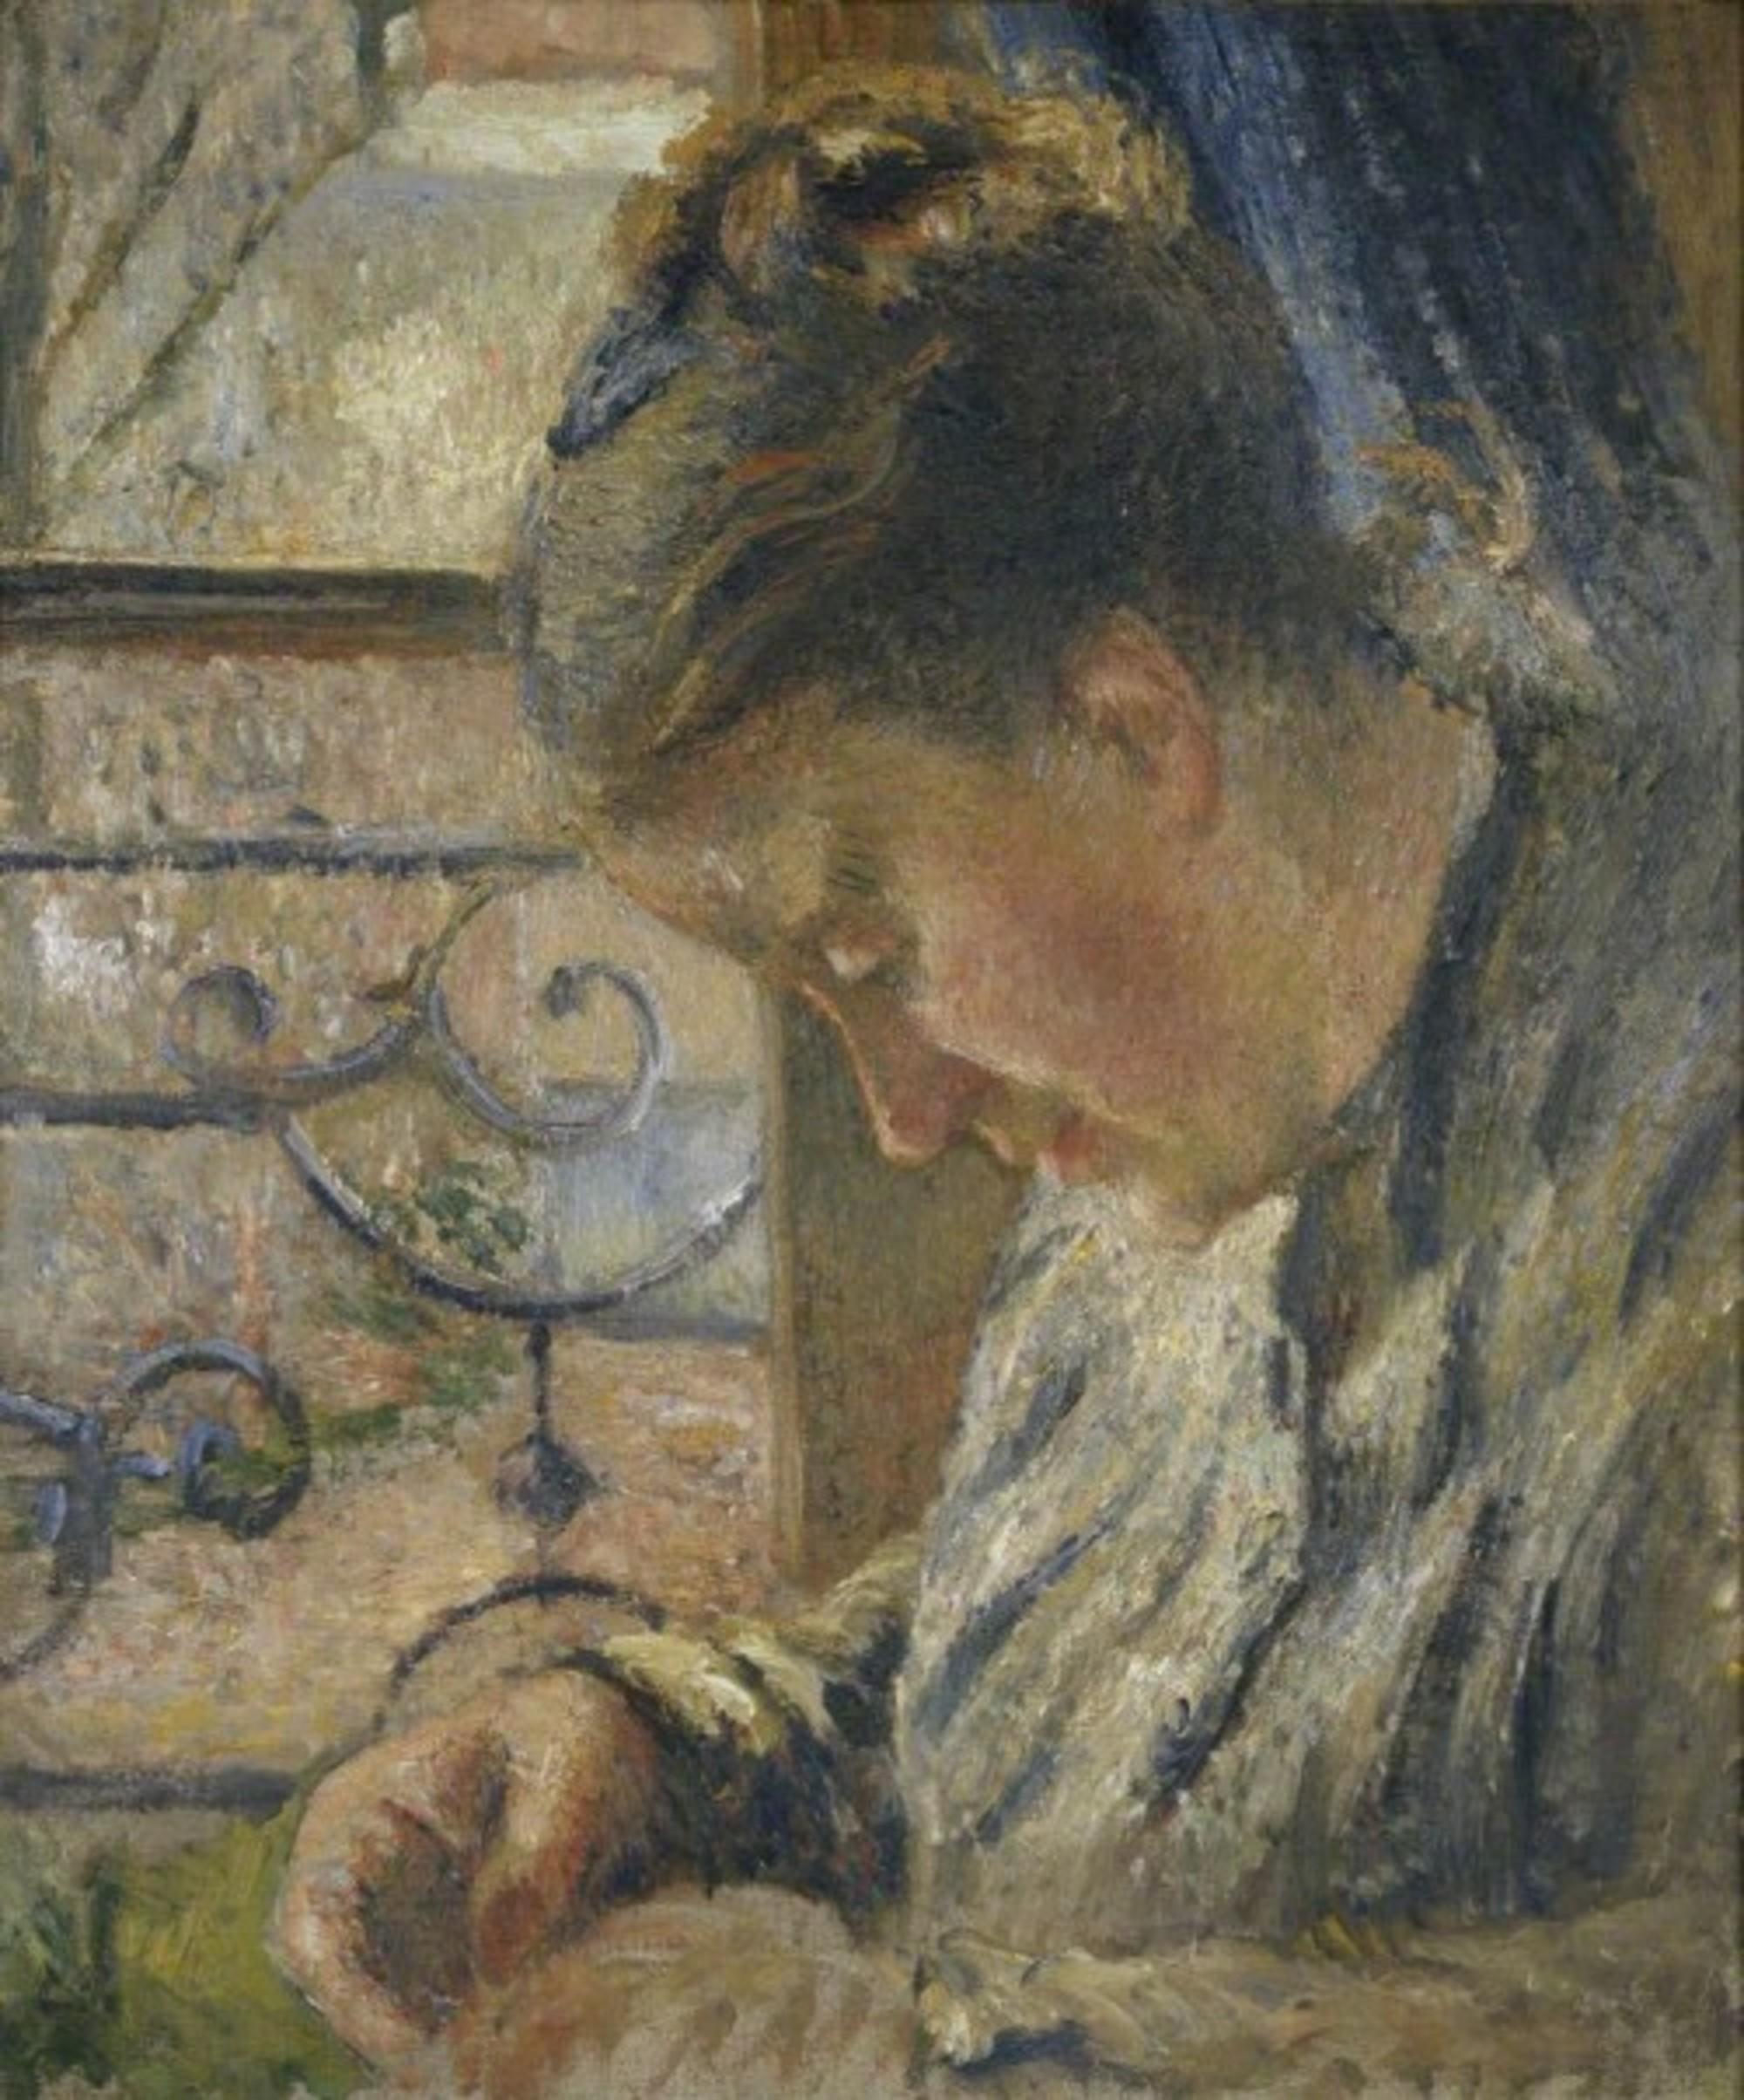 Camille-Pissarro---Mme-Pissarro-sewing-beside-a-Window---Ashmolean-Museum.jpg